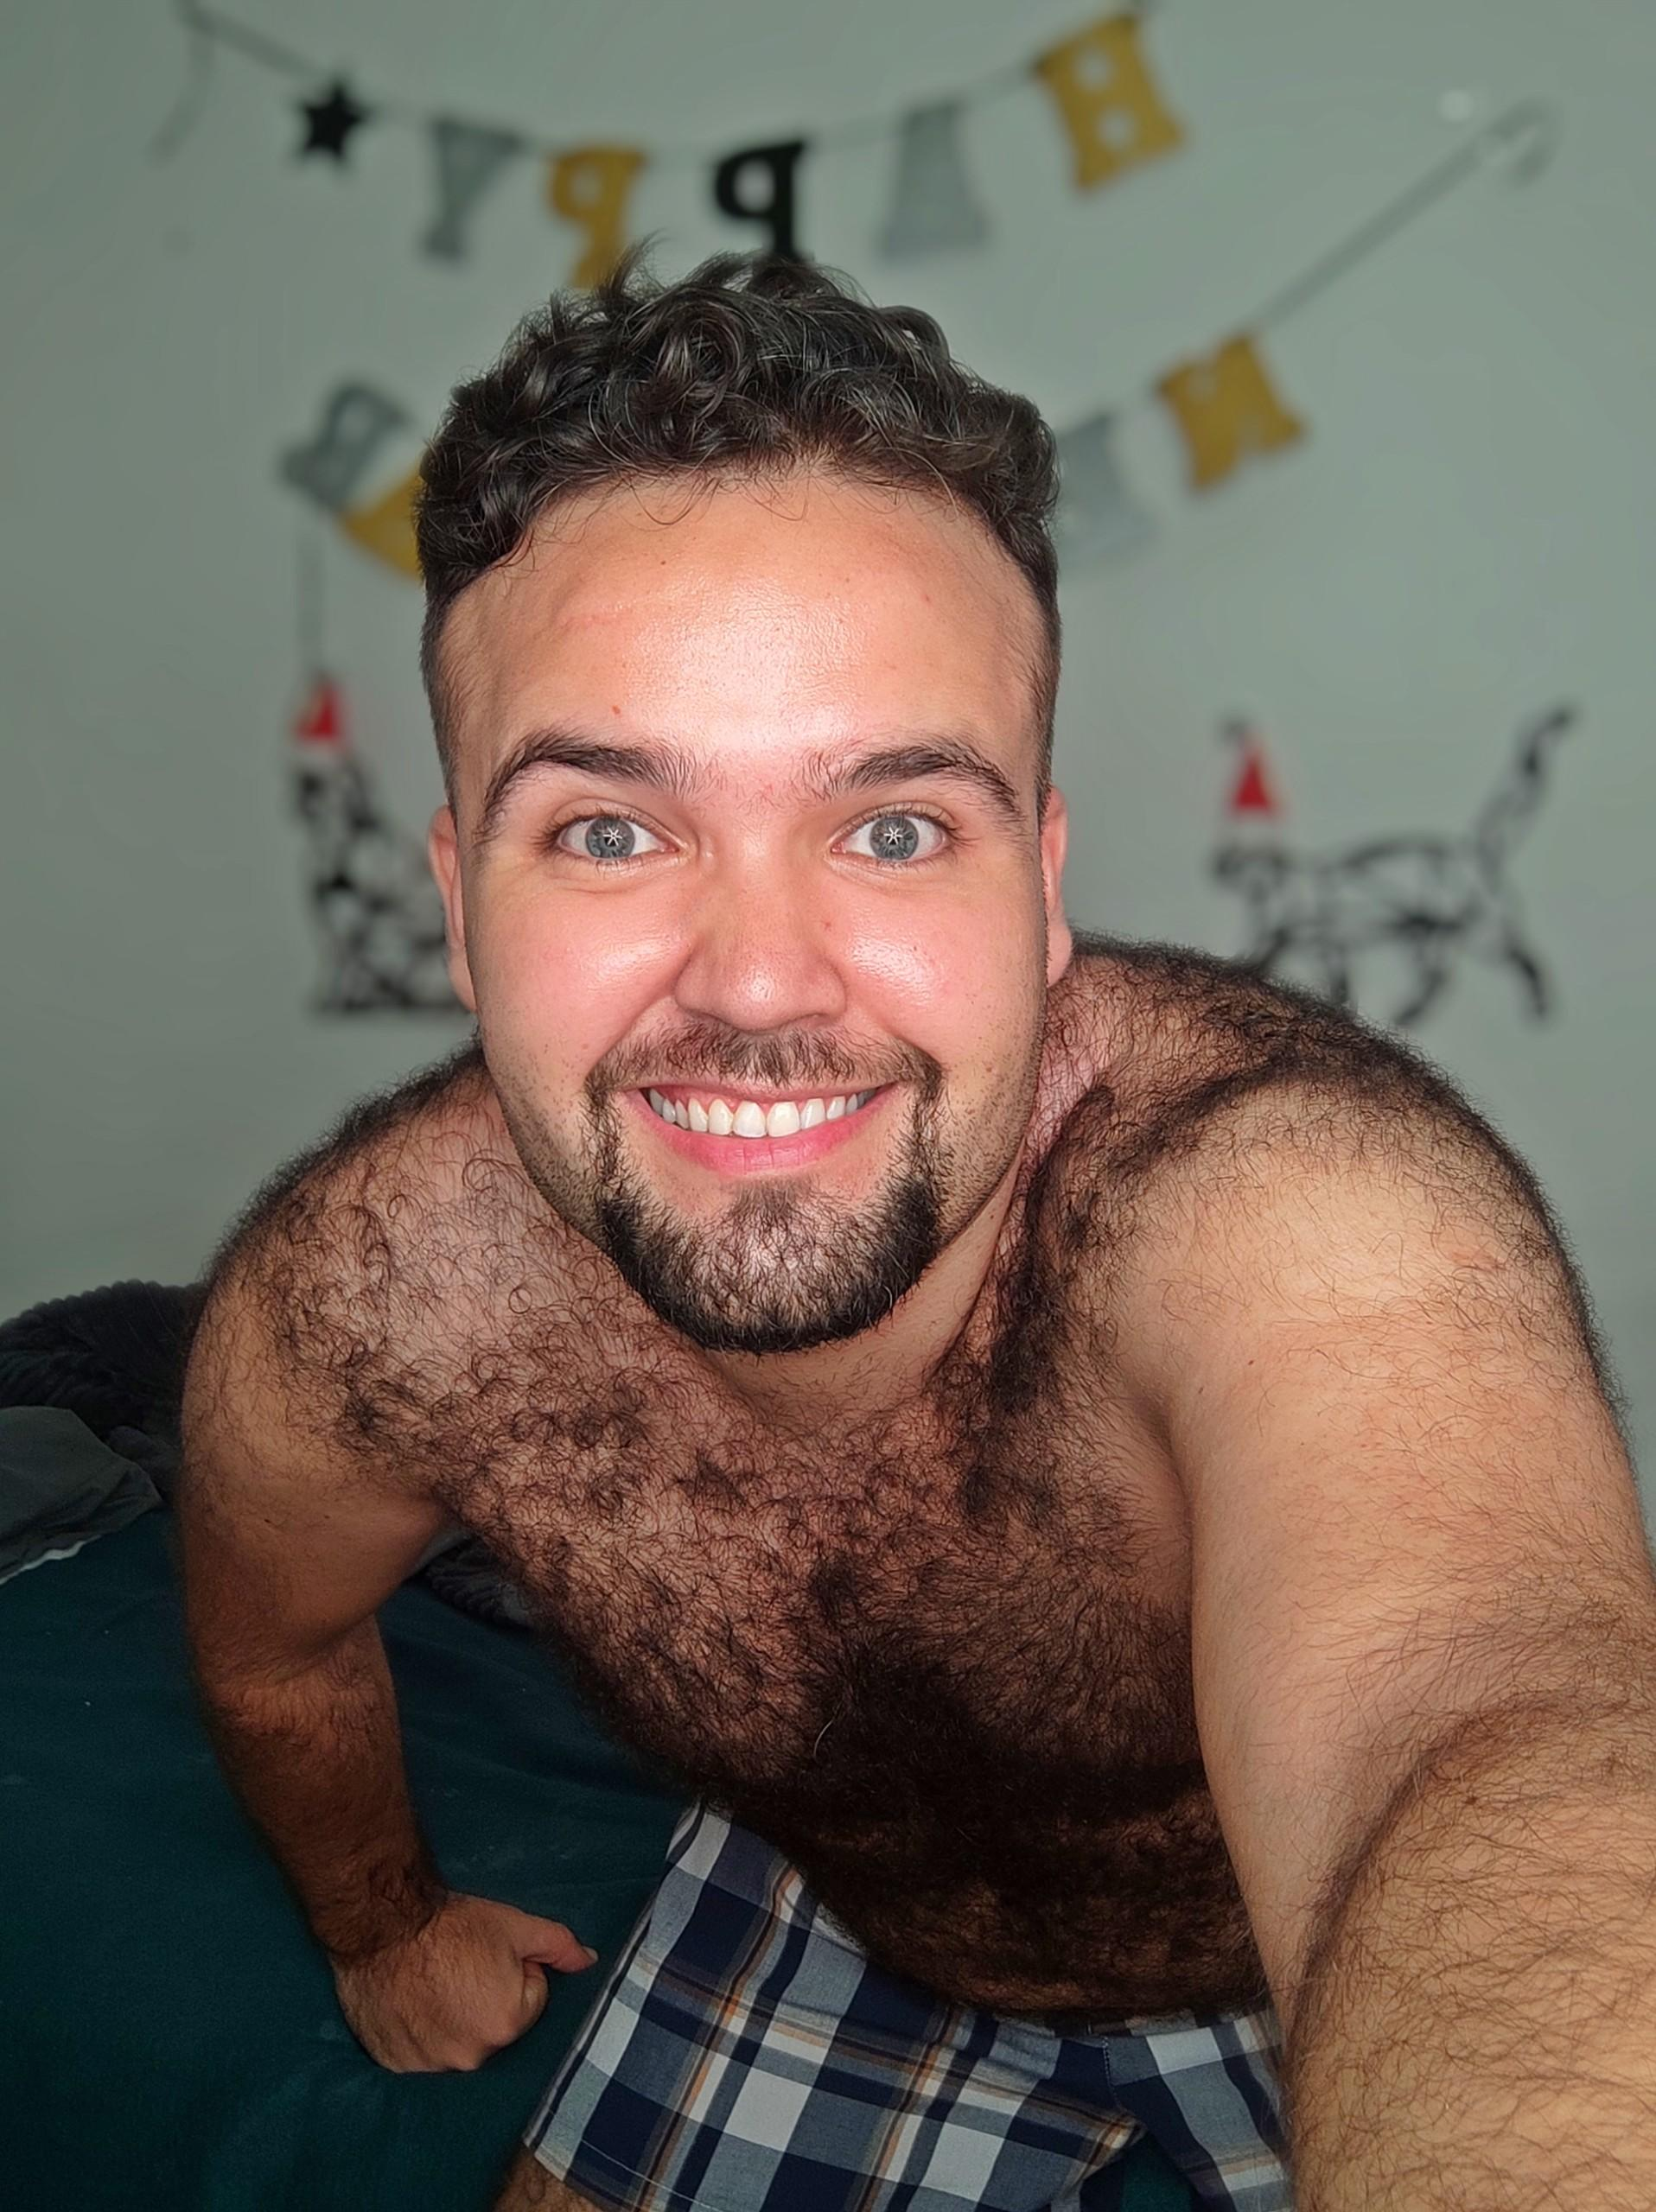 Werewolfm?s=96ks0xaqtljlhm4shgra21yrgikvk2dzgxsh2jwslwc=